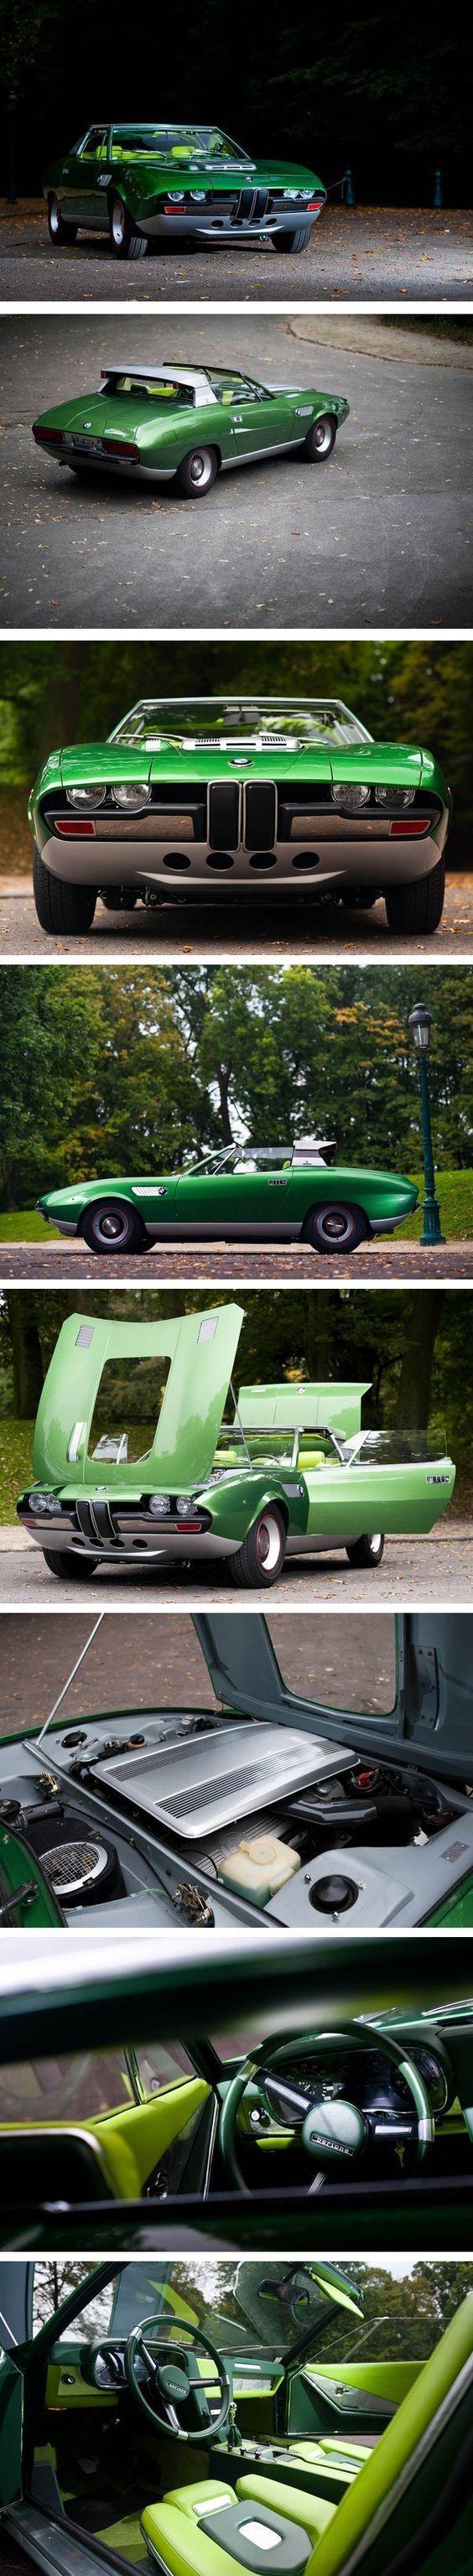 2800 BMW Spicup 1969: https://www.amazon.co.uk/Baby-Car-Mirror-Shatterproof-Installation/dp/B06XHG6SSY/ref=sr_1_2?ie=UTF8&qid=1499074433&sr=8-2&keywords=Kingseye